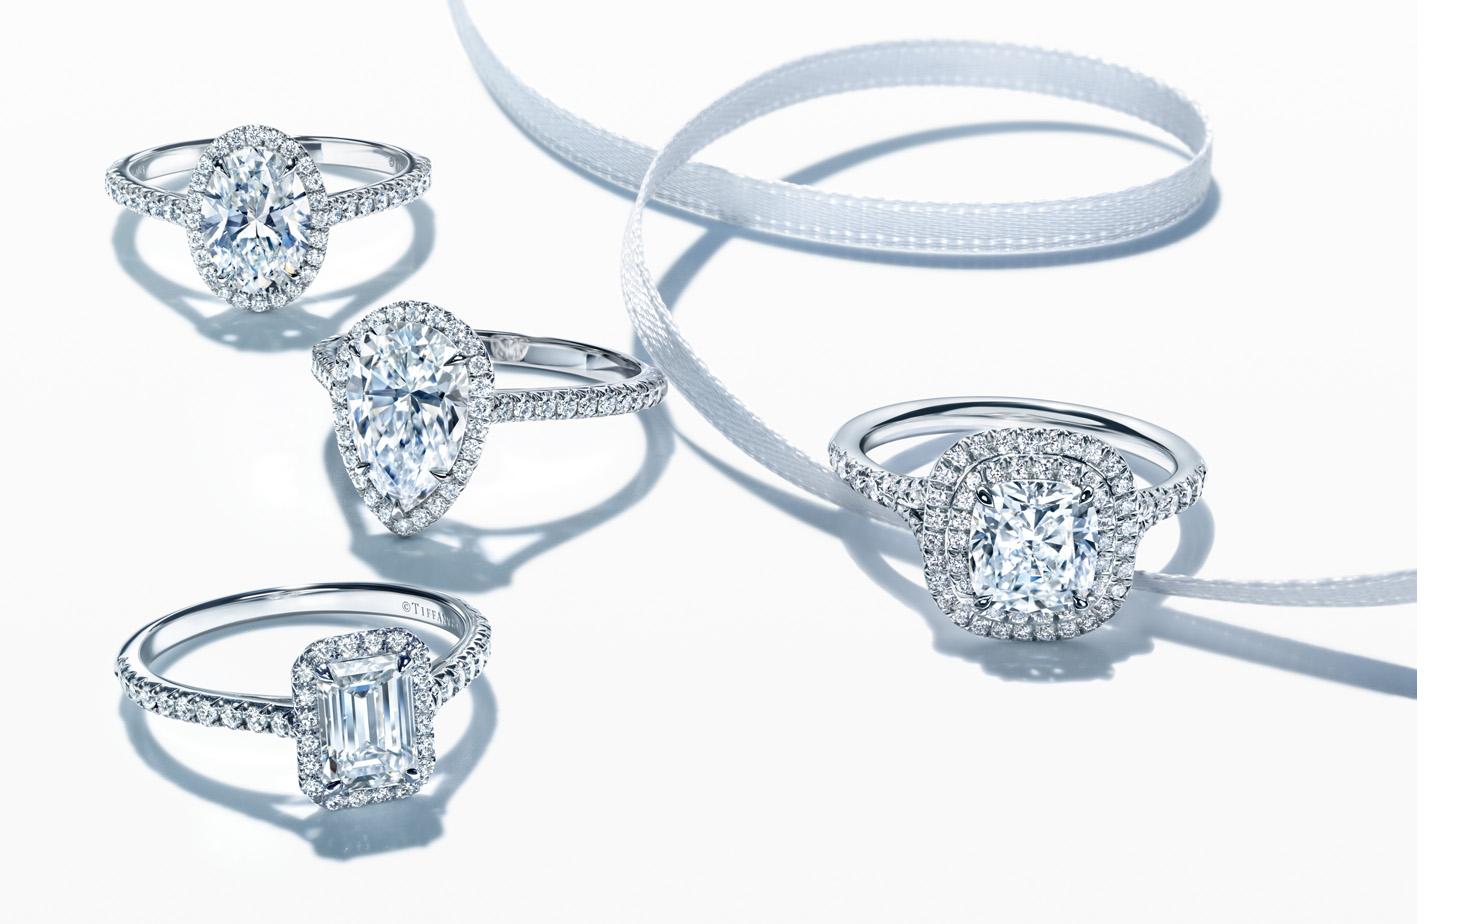 Tiffany Engagement   CREATIVE DIRECTOR Peter Koblish